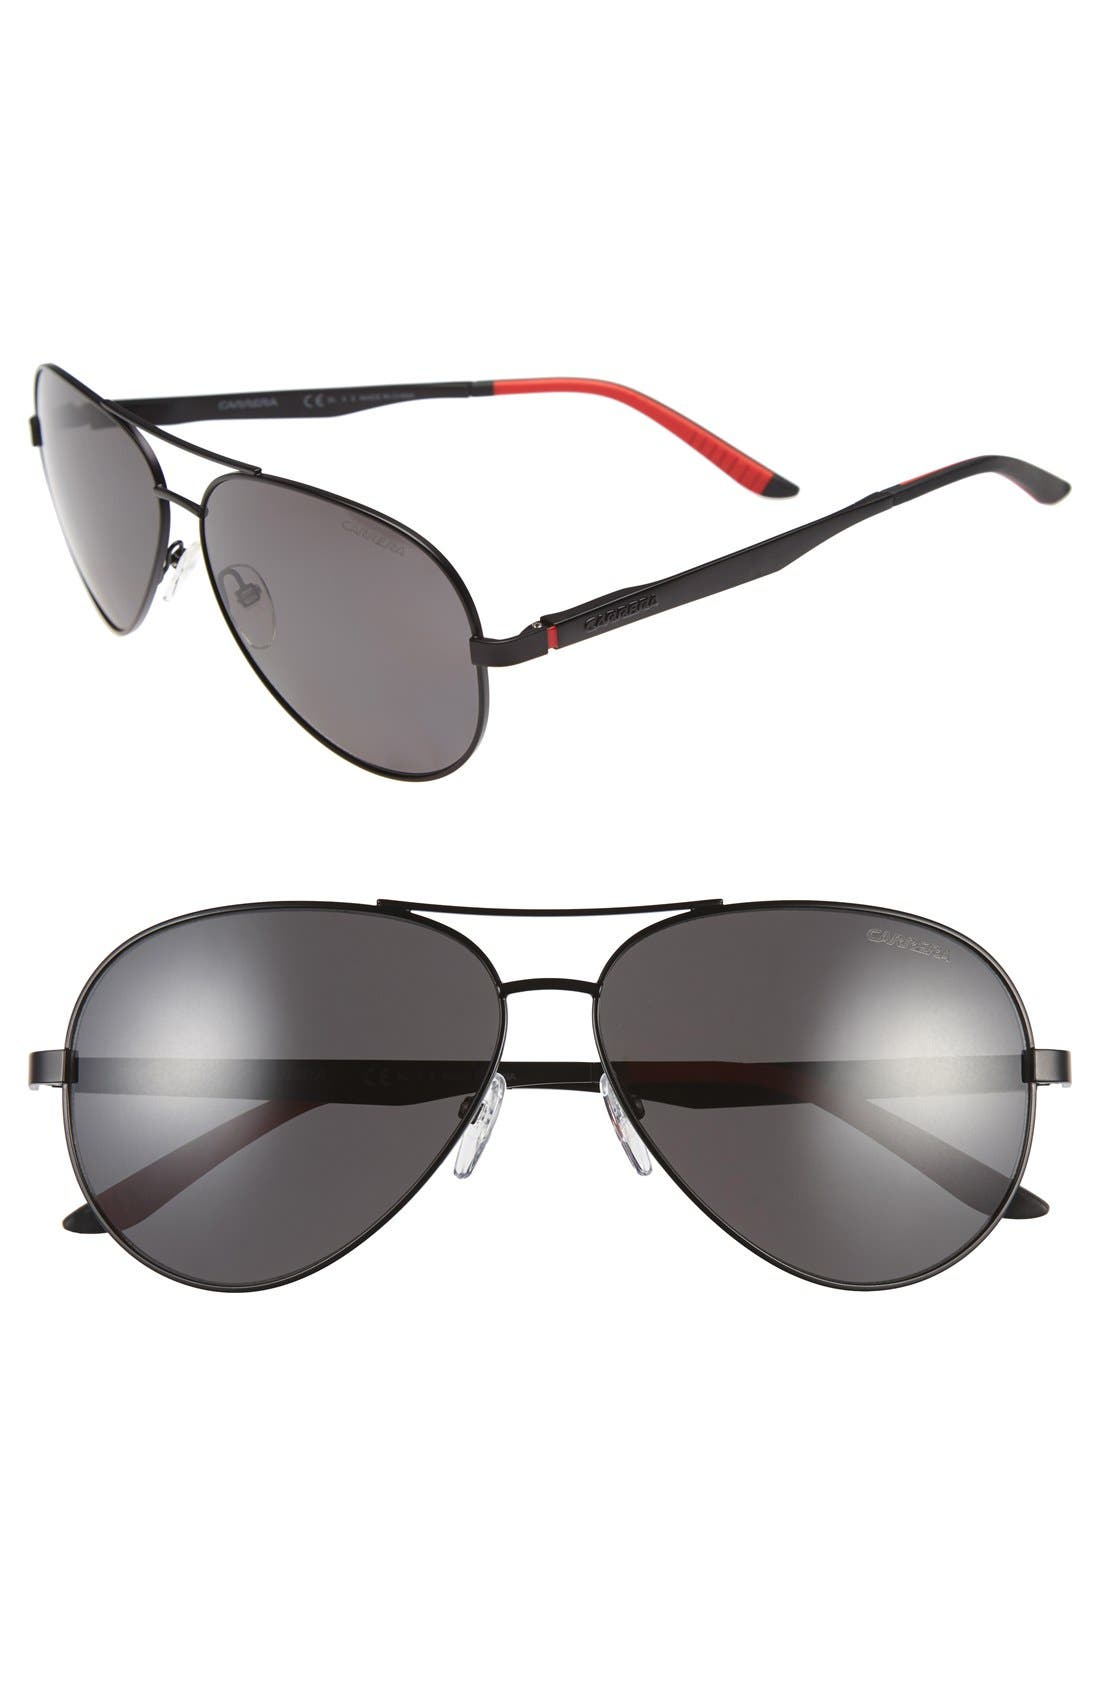 Carrera Eyewear 5m Metal Aviator Sunglasses -